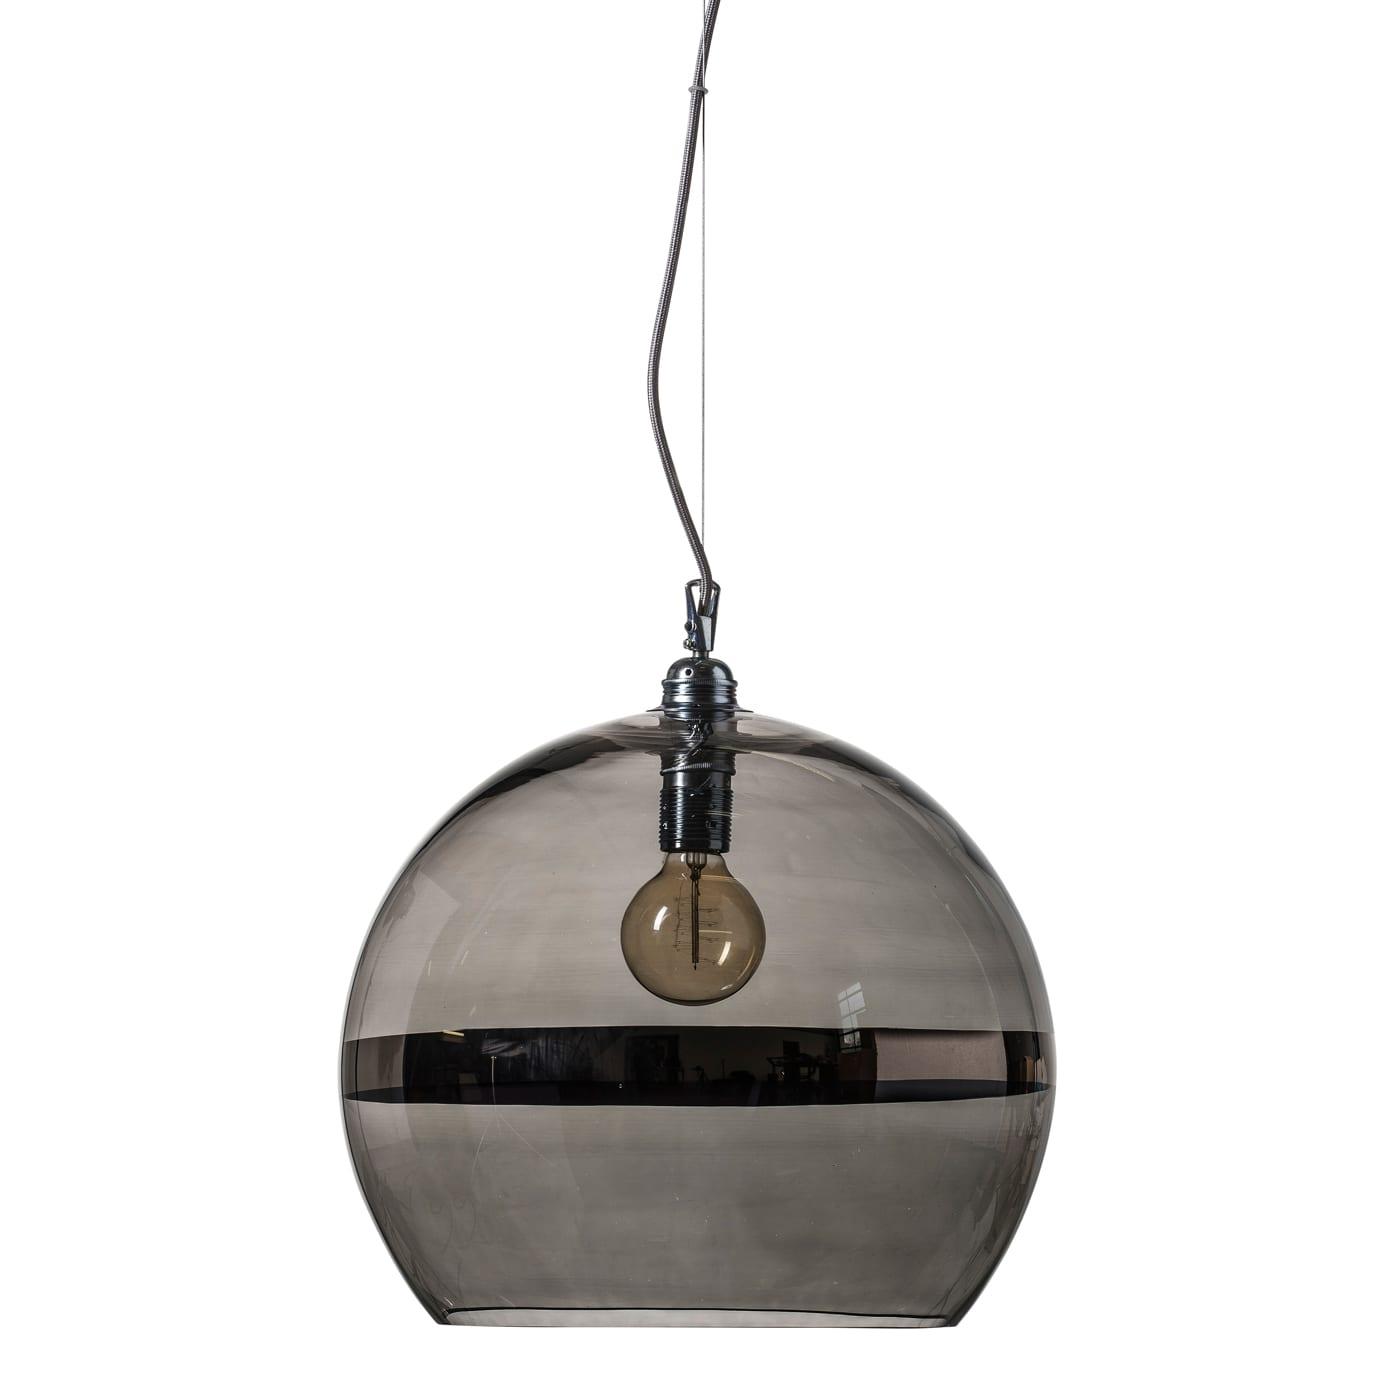 Rowan pendant lamp, platinum stripe on grey, 39cm